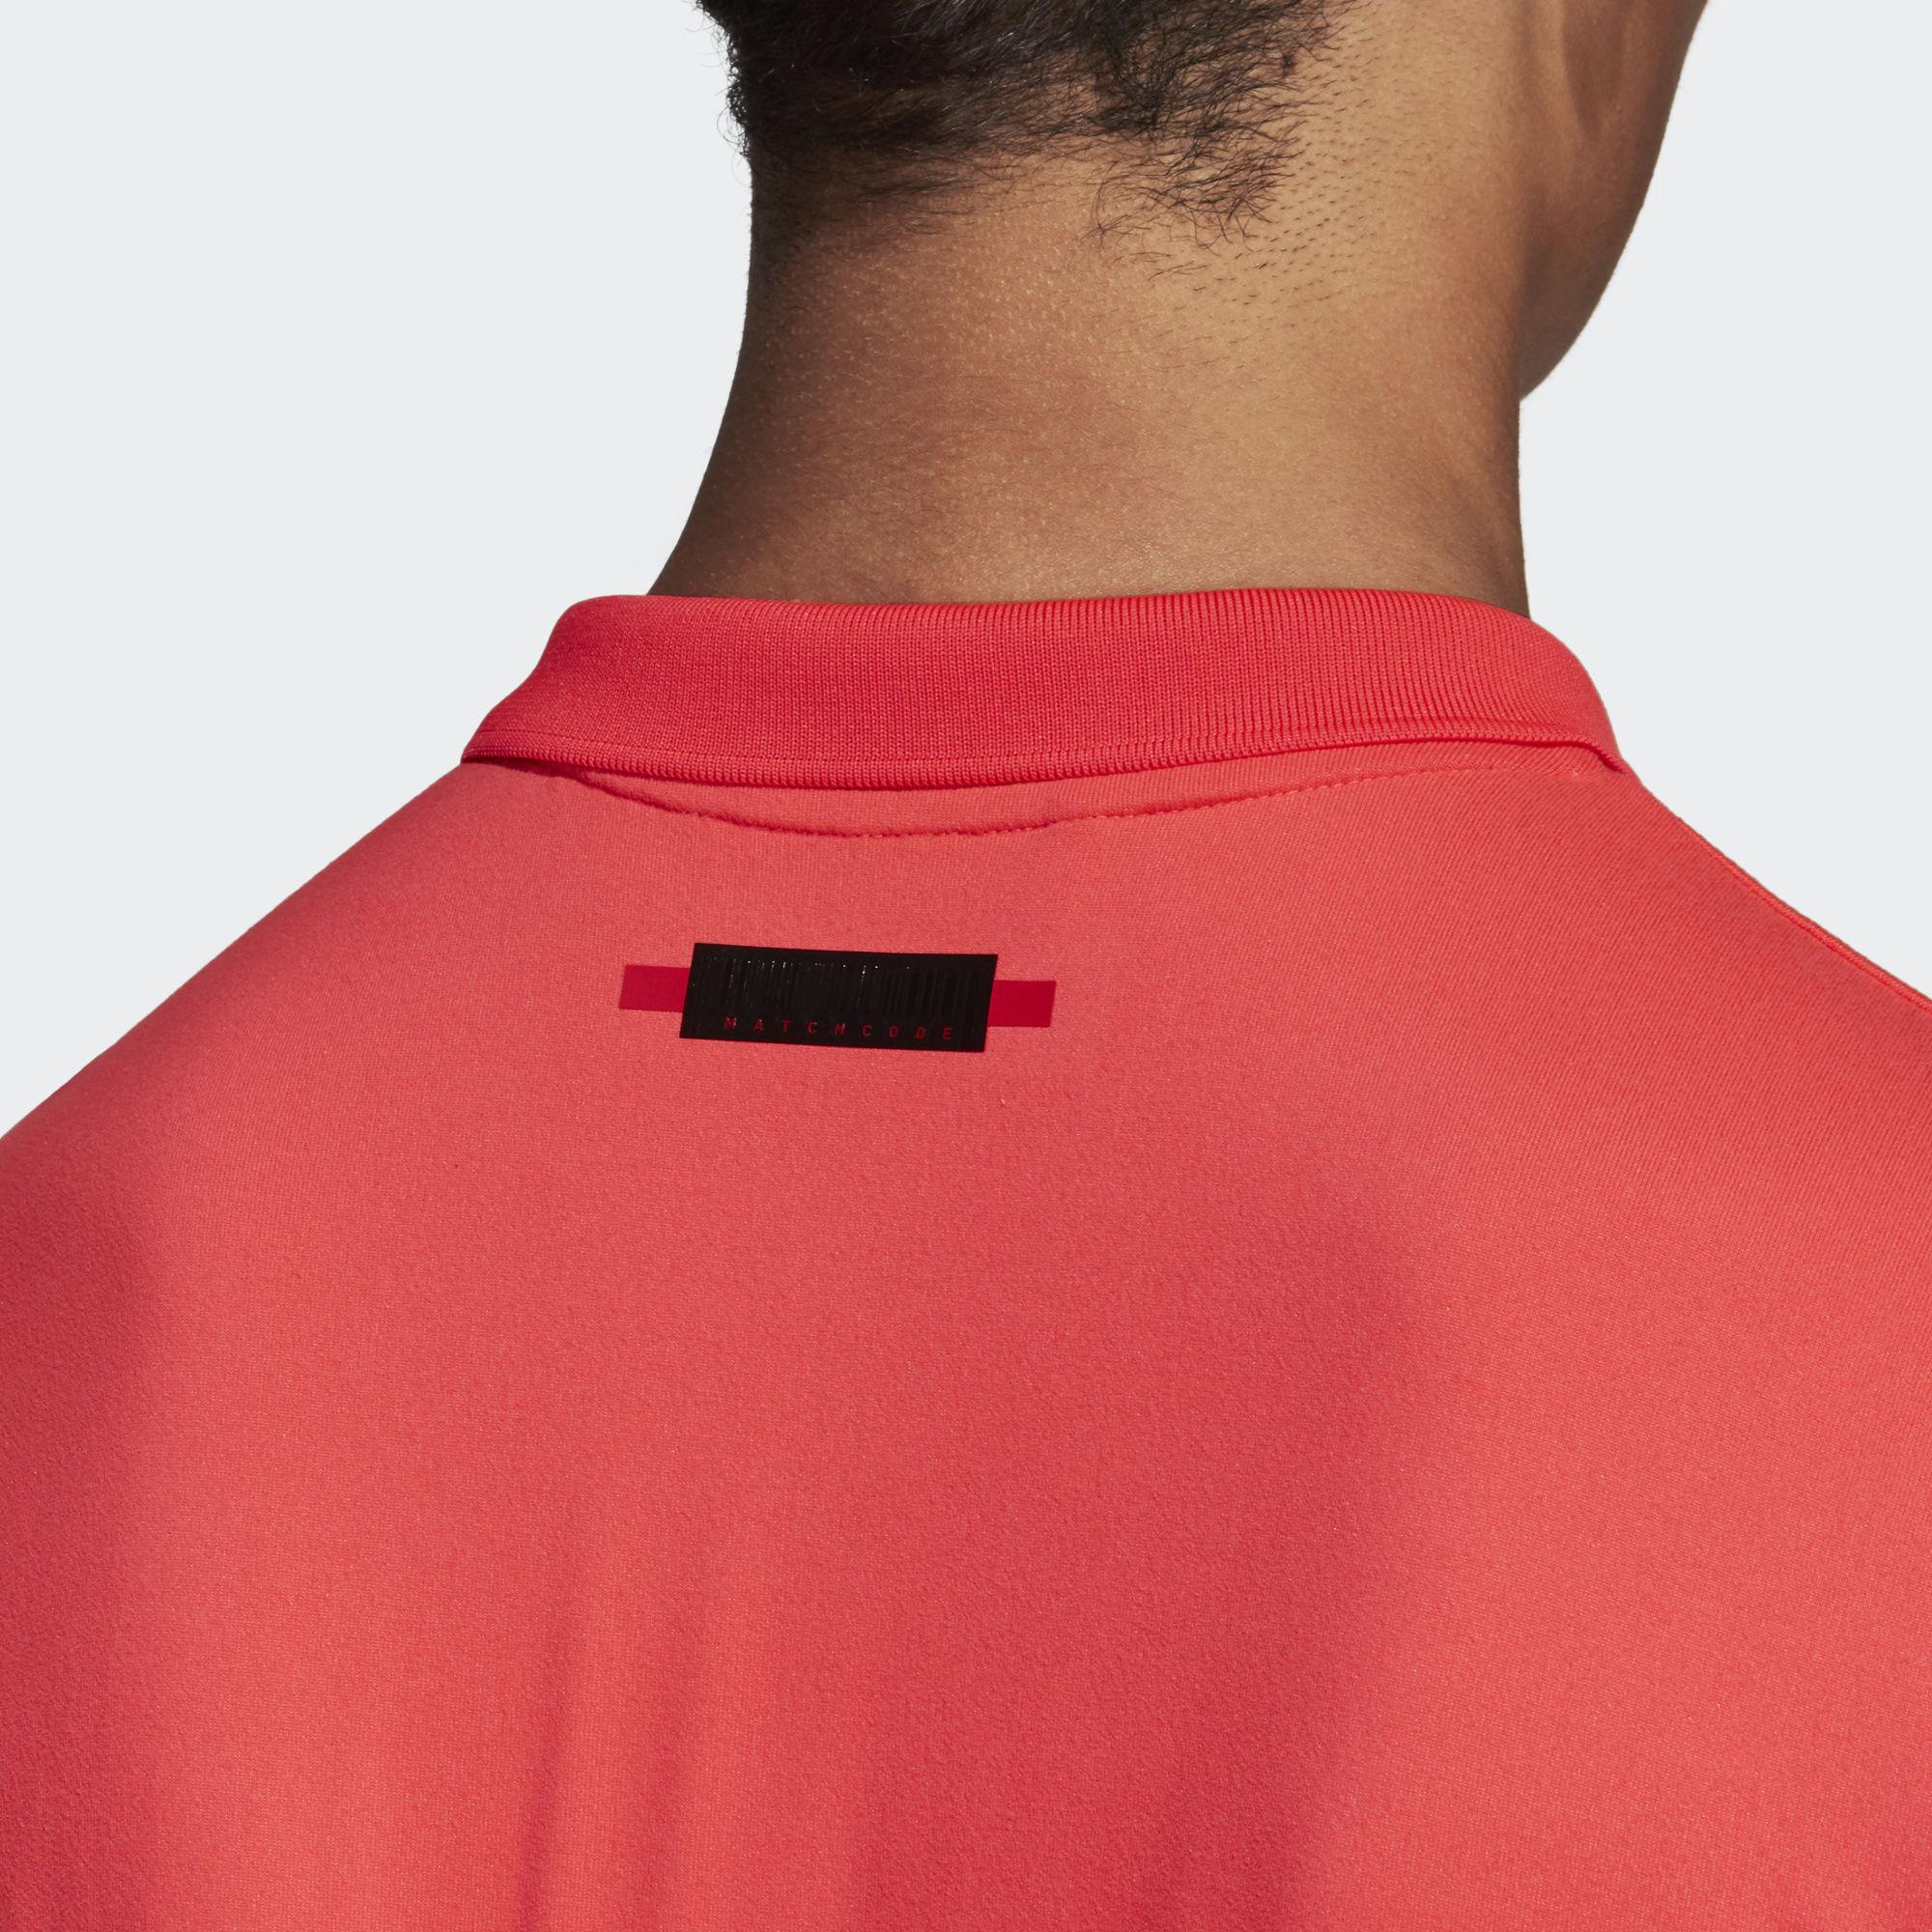 Adidas Mens MatchCode Polo Shirt - Shock Red Night Met - Tennisnuts.com 5e74faa45bfb9